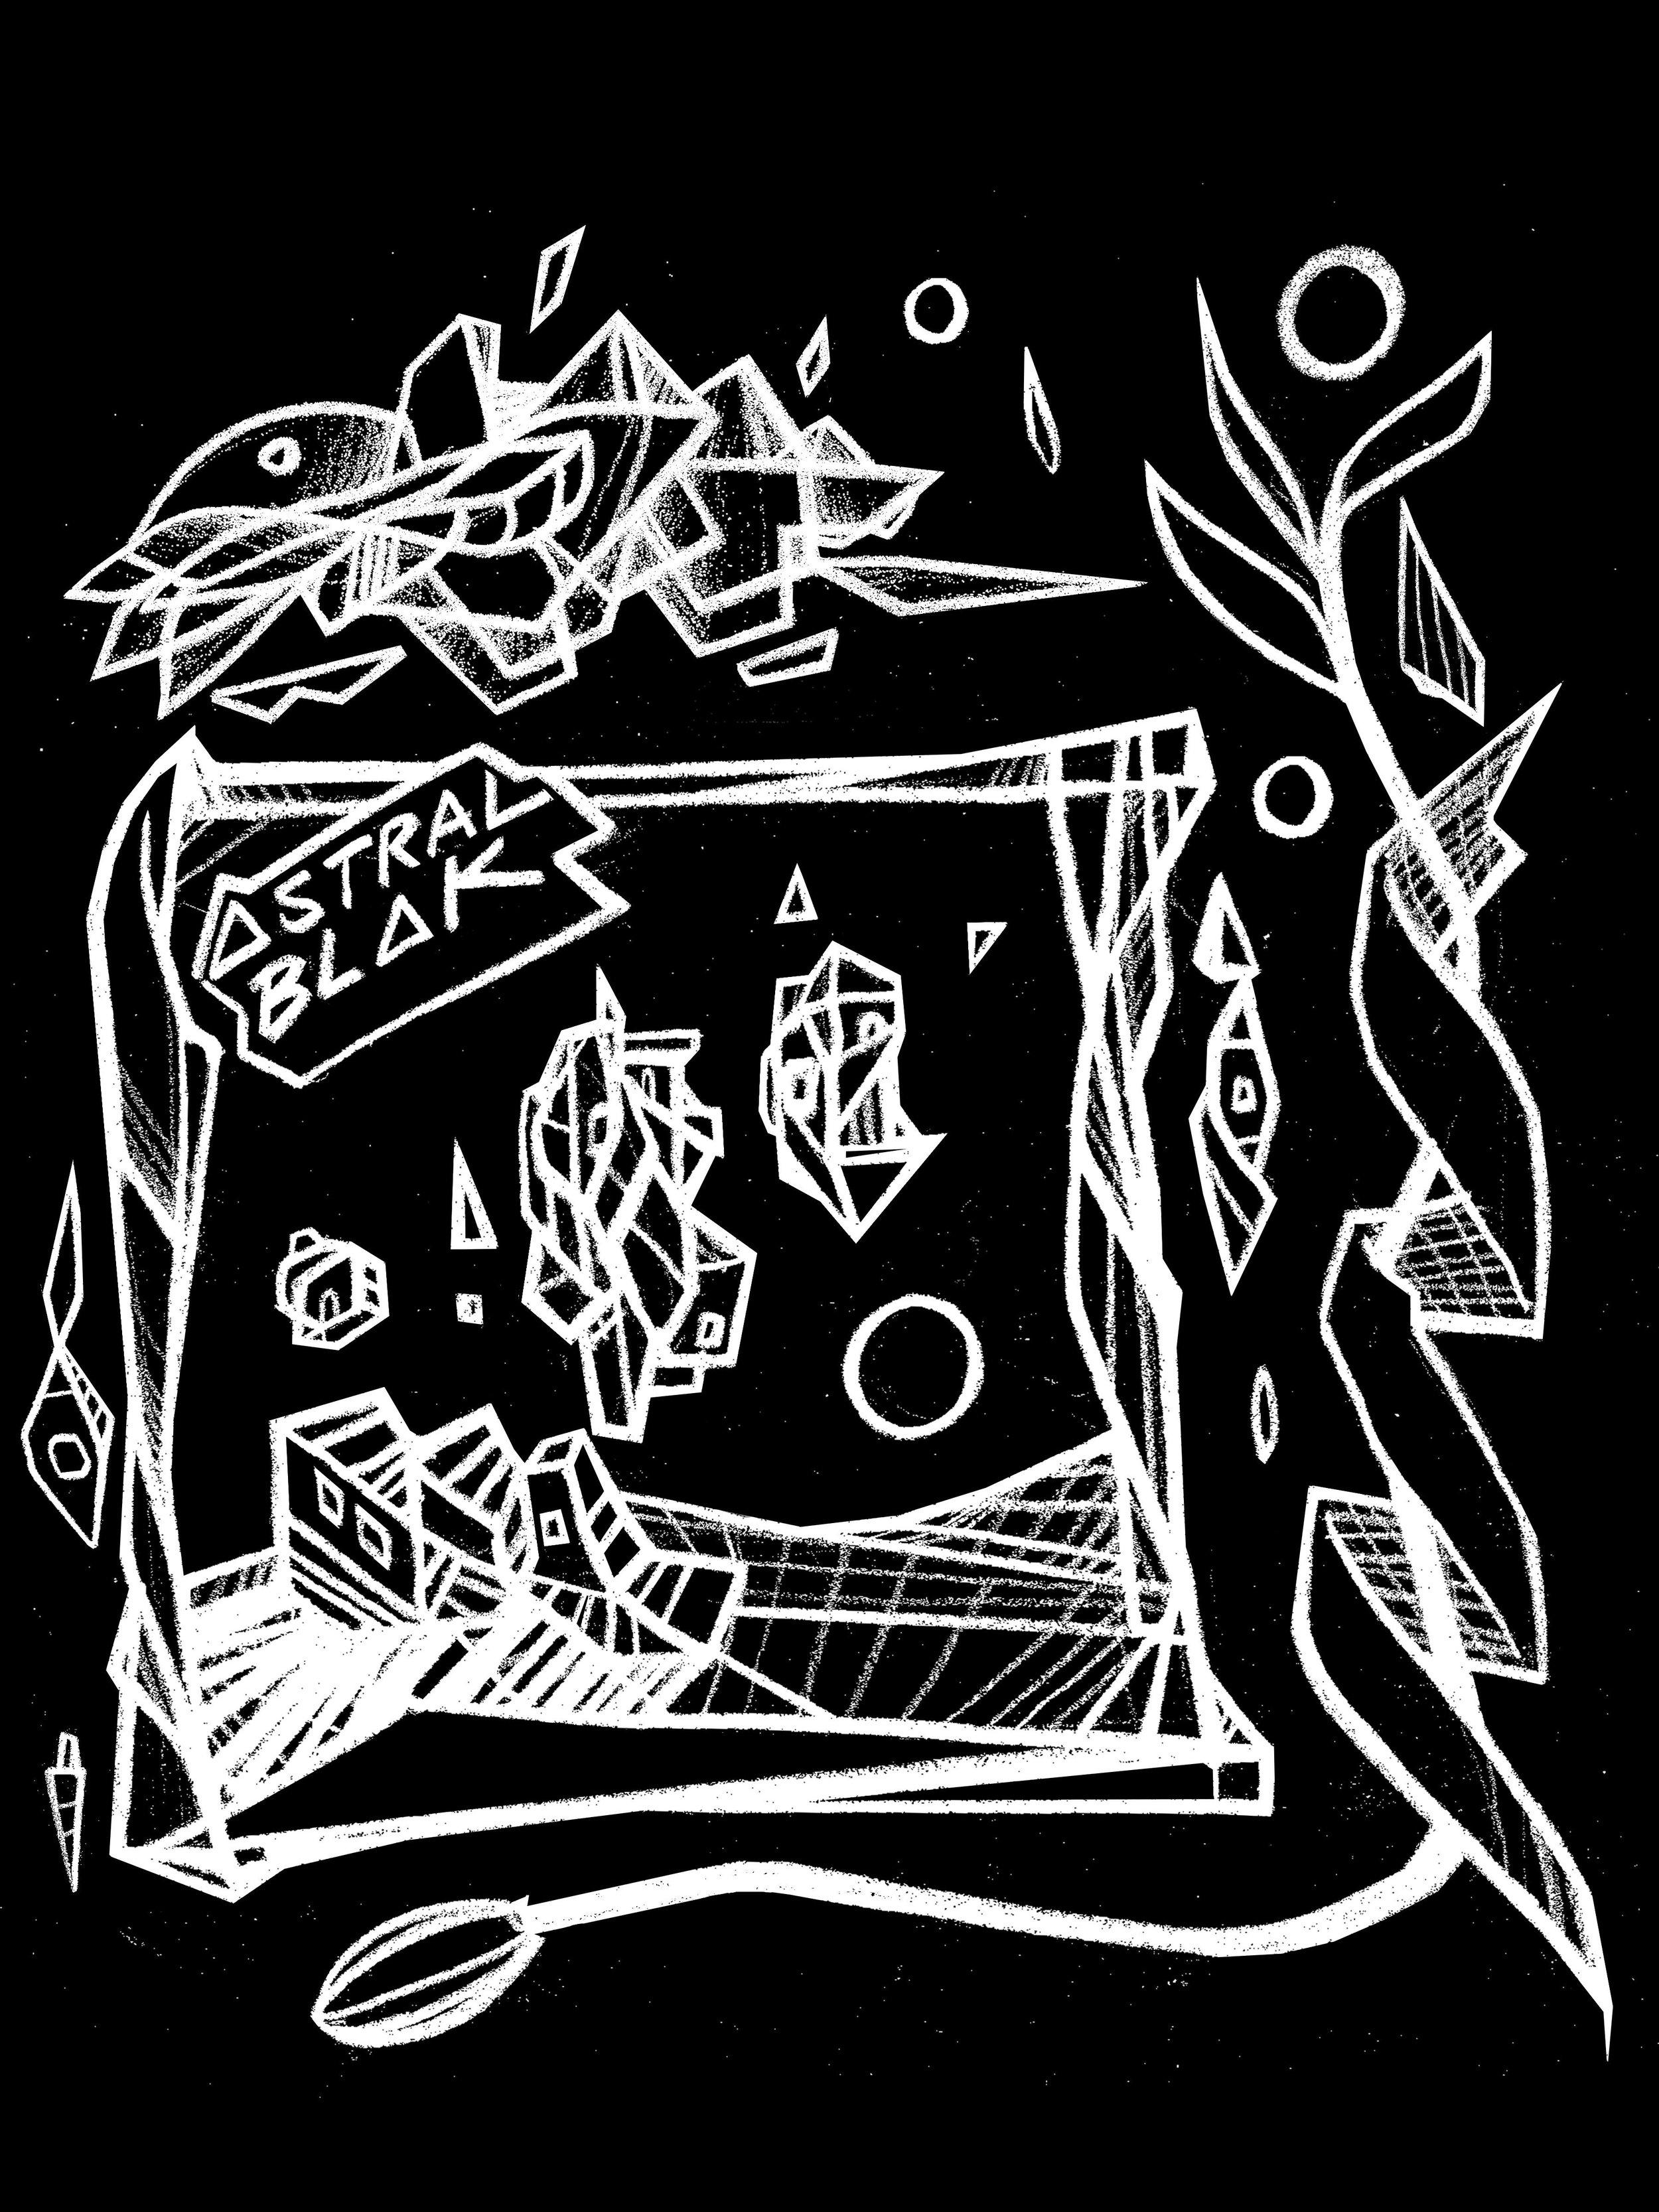 AstralBlak: Seeds - Sandhouses